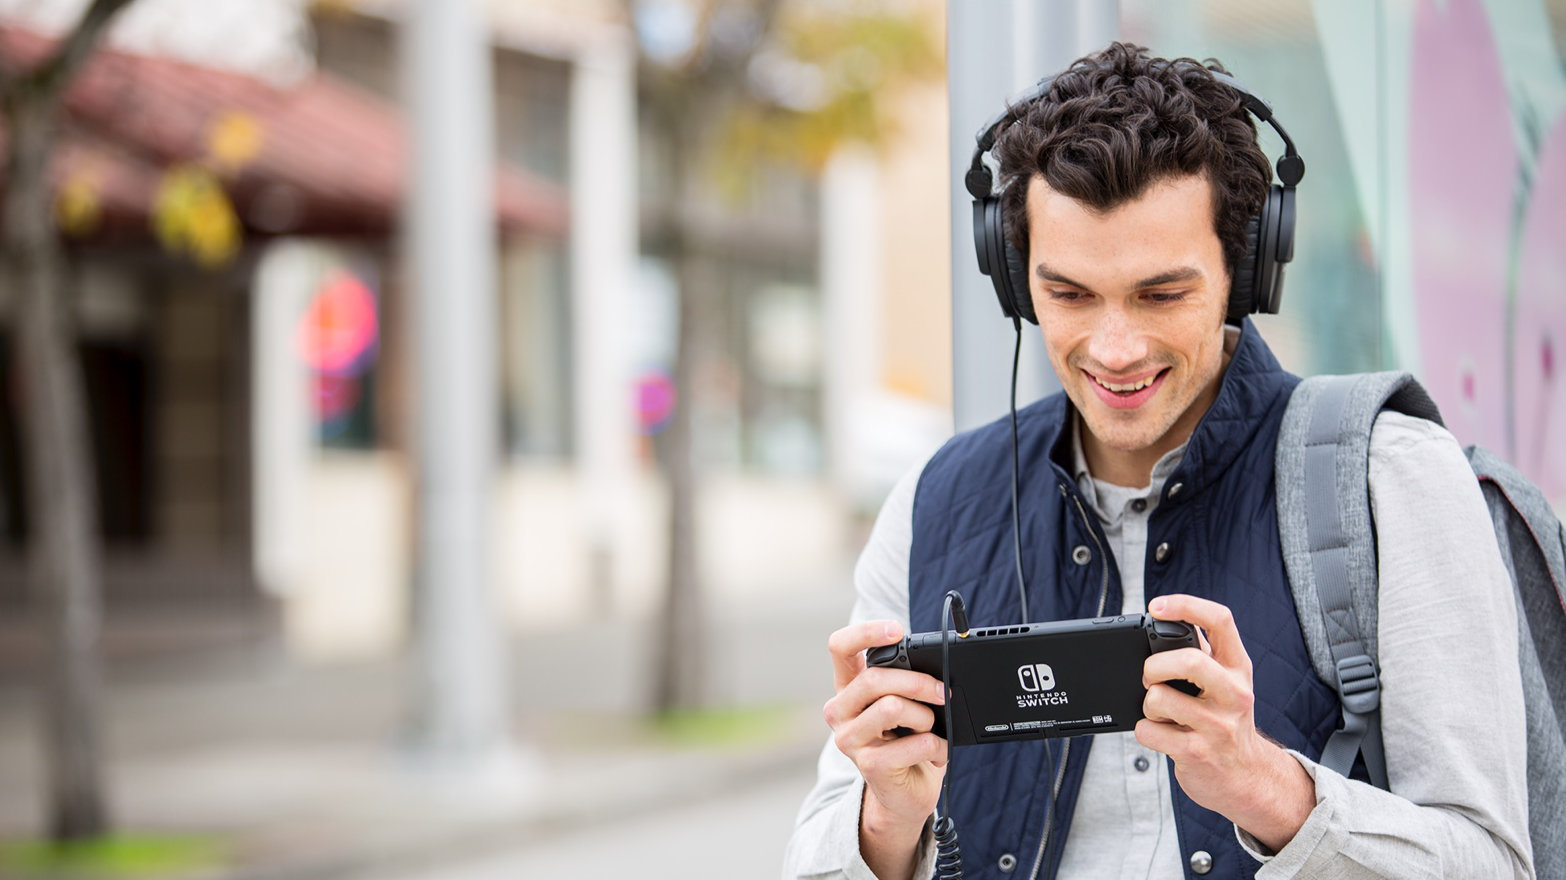 Nintendo Switch gamer with headphones